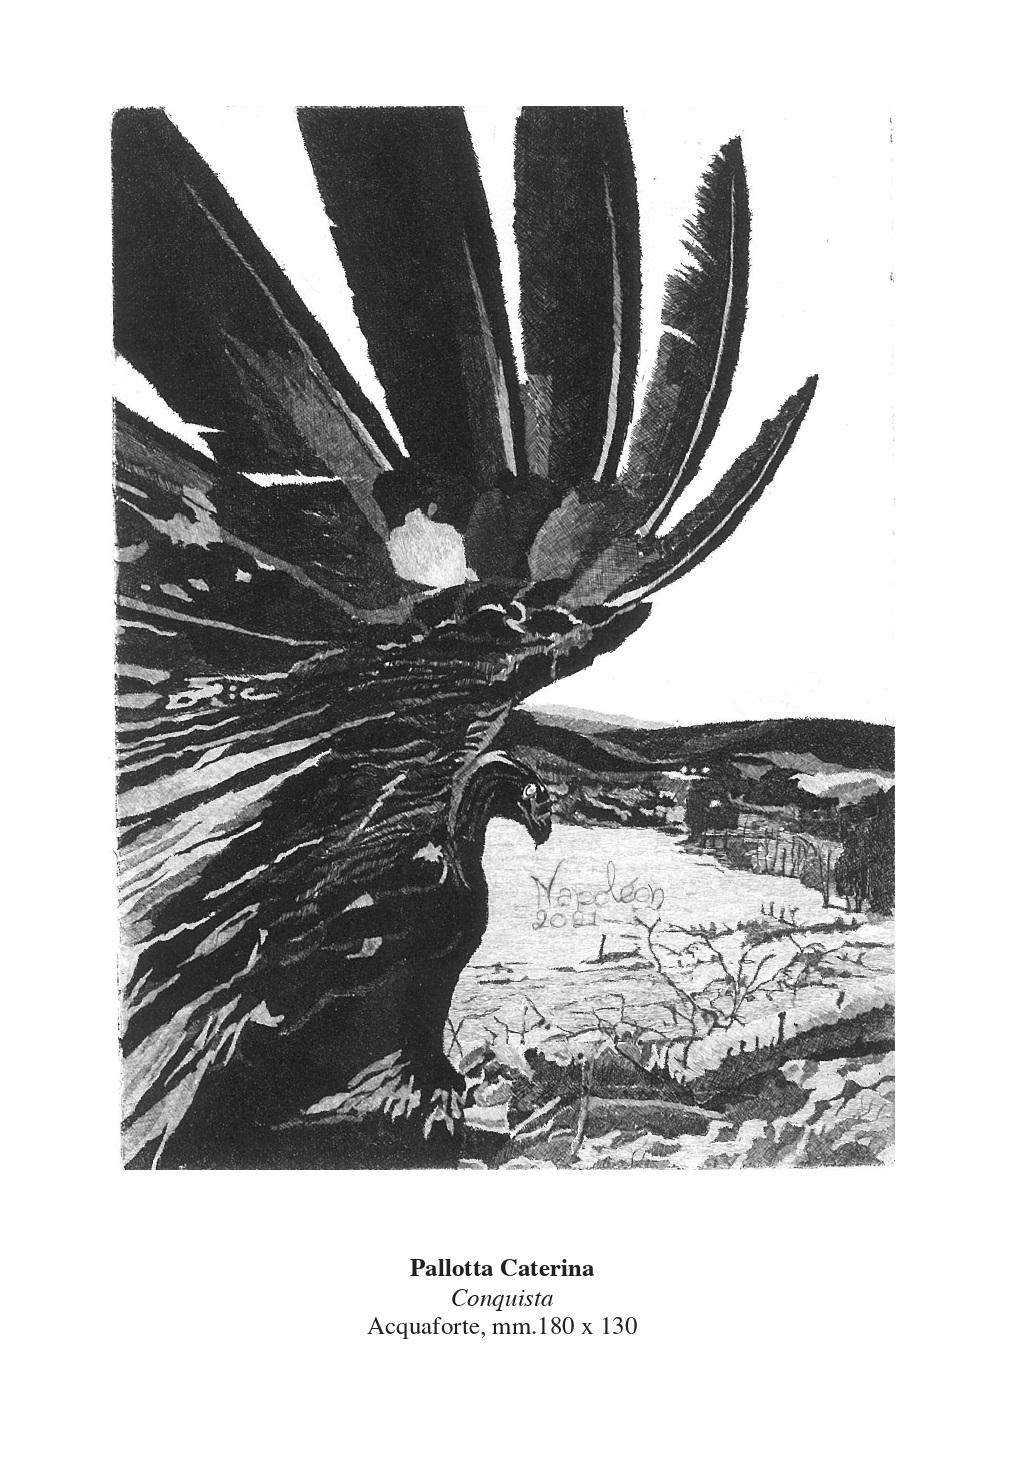 CATALOGO exlibris 2021-115_page-0001